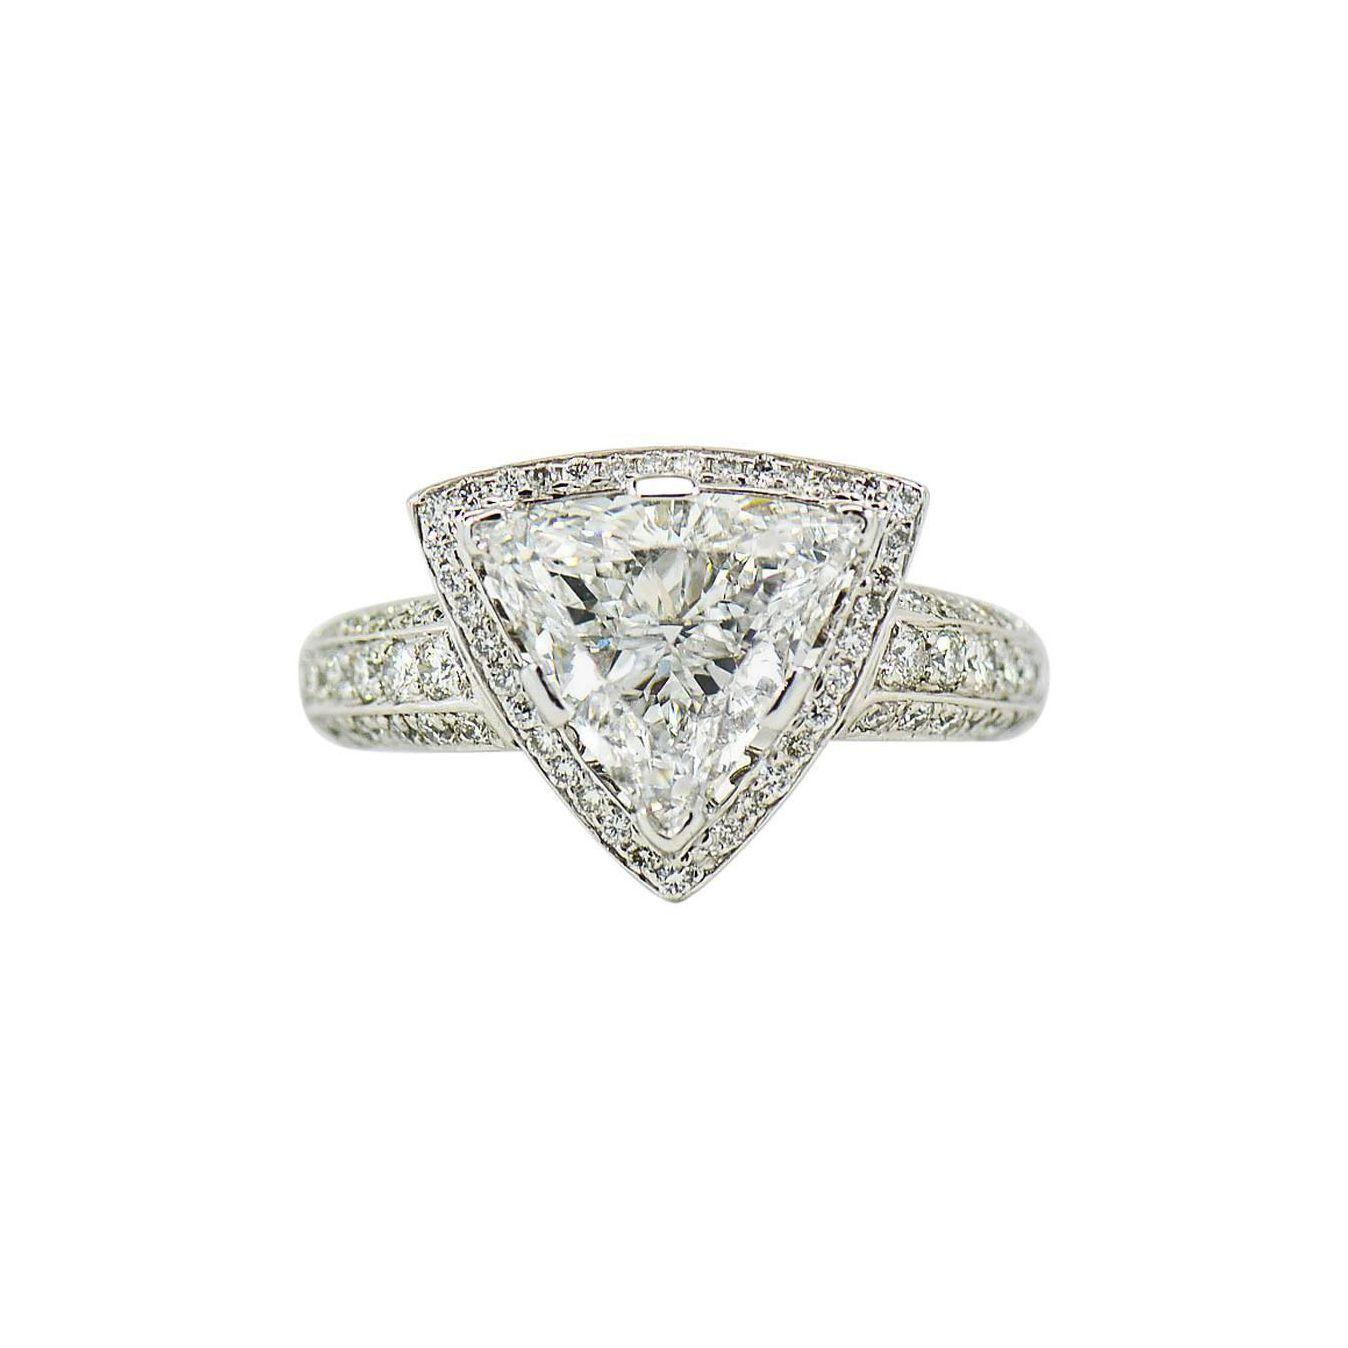 1stDibs 1stDibs GIA Certified 3.00 Carat E, VS1 Trilliant Center in Diamond Halo Platinum Ring